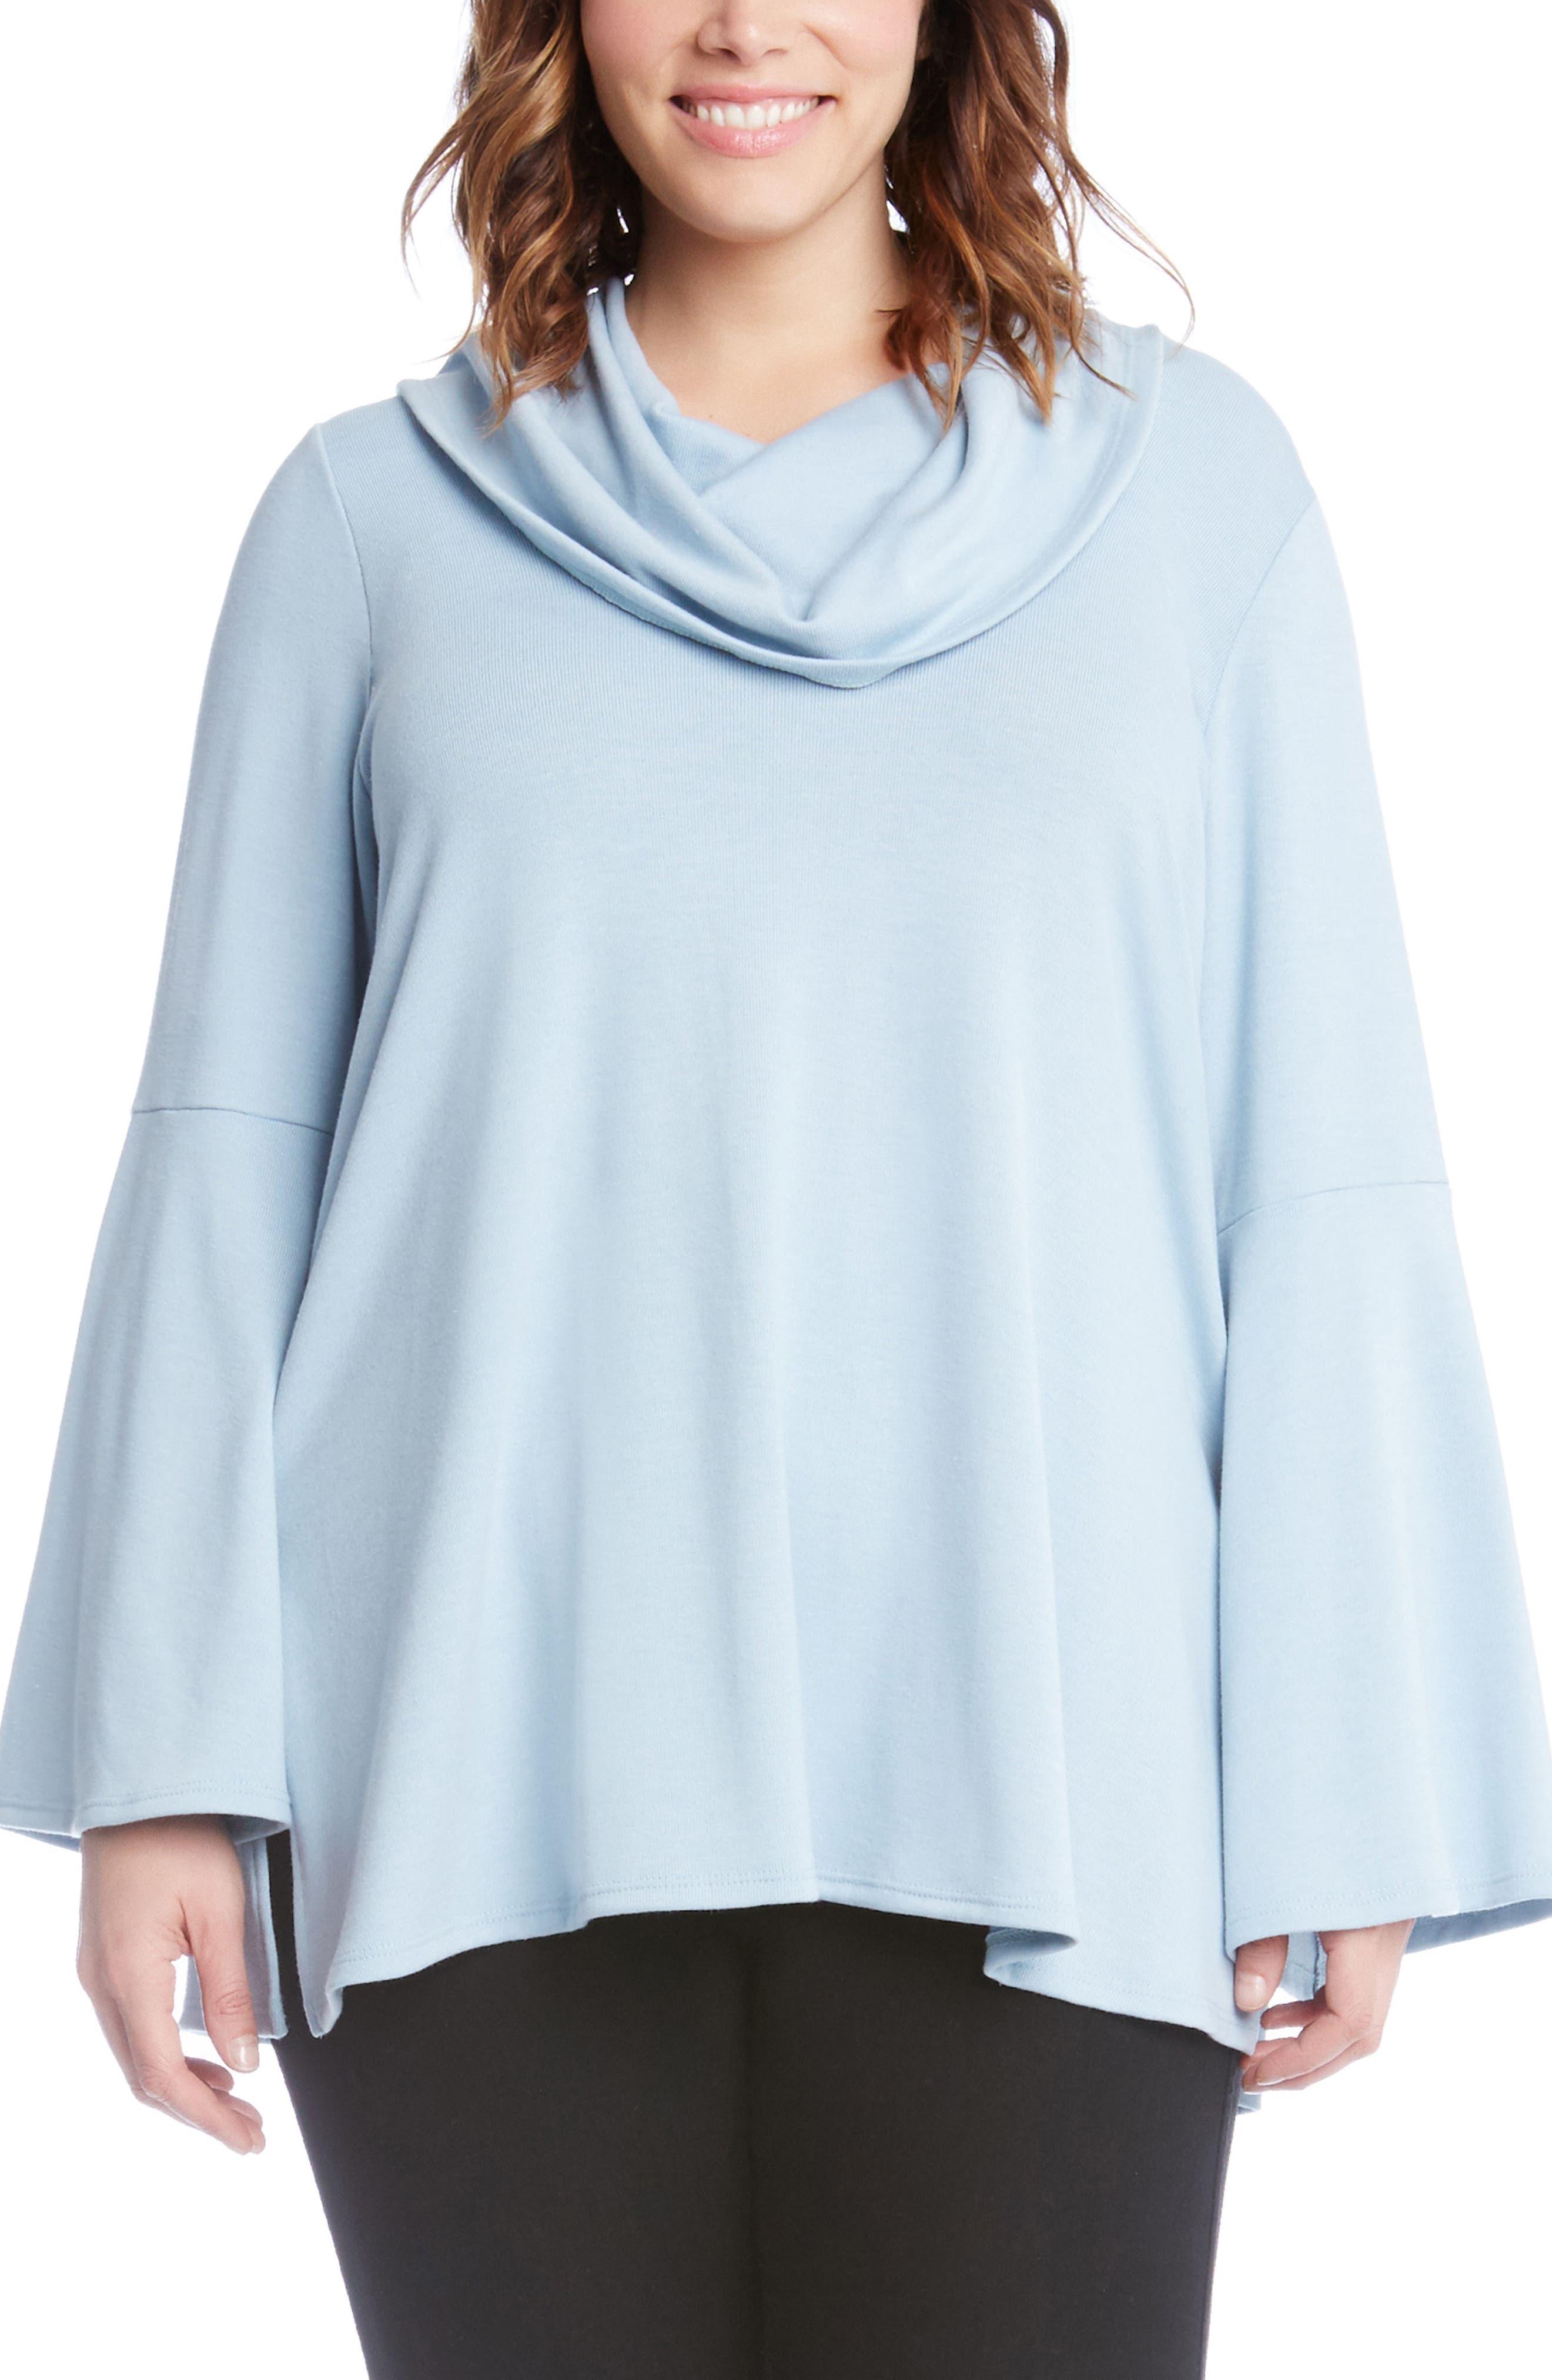 Alternate Image 1 Selected - Karen Kane Flare Sleeve Cowl Neck Sweater (Plus Size)